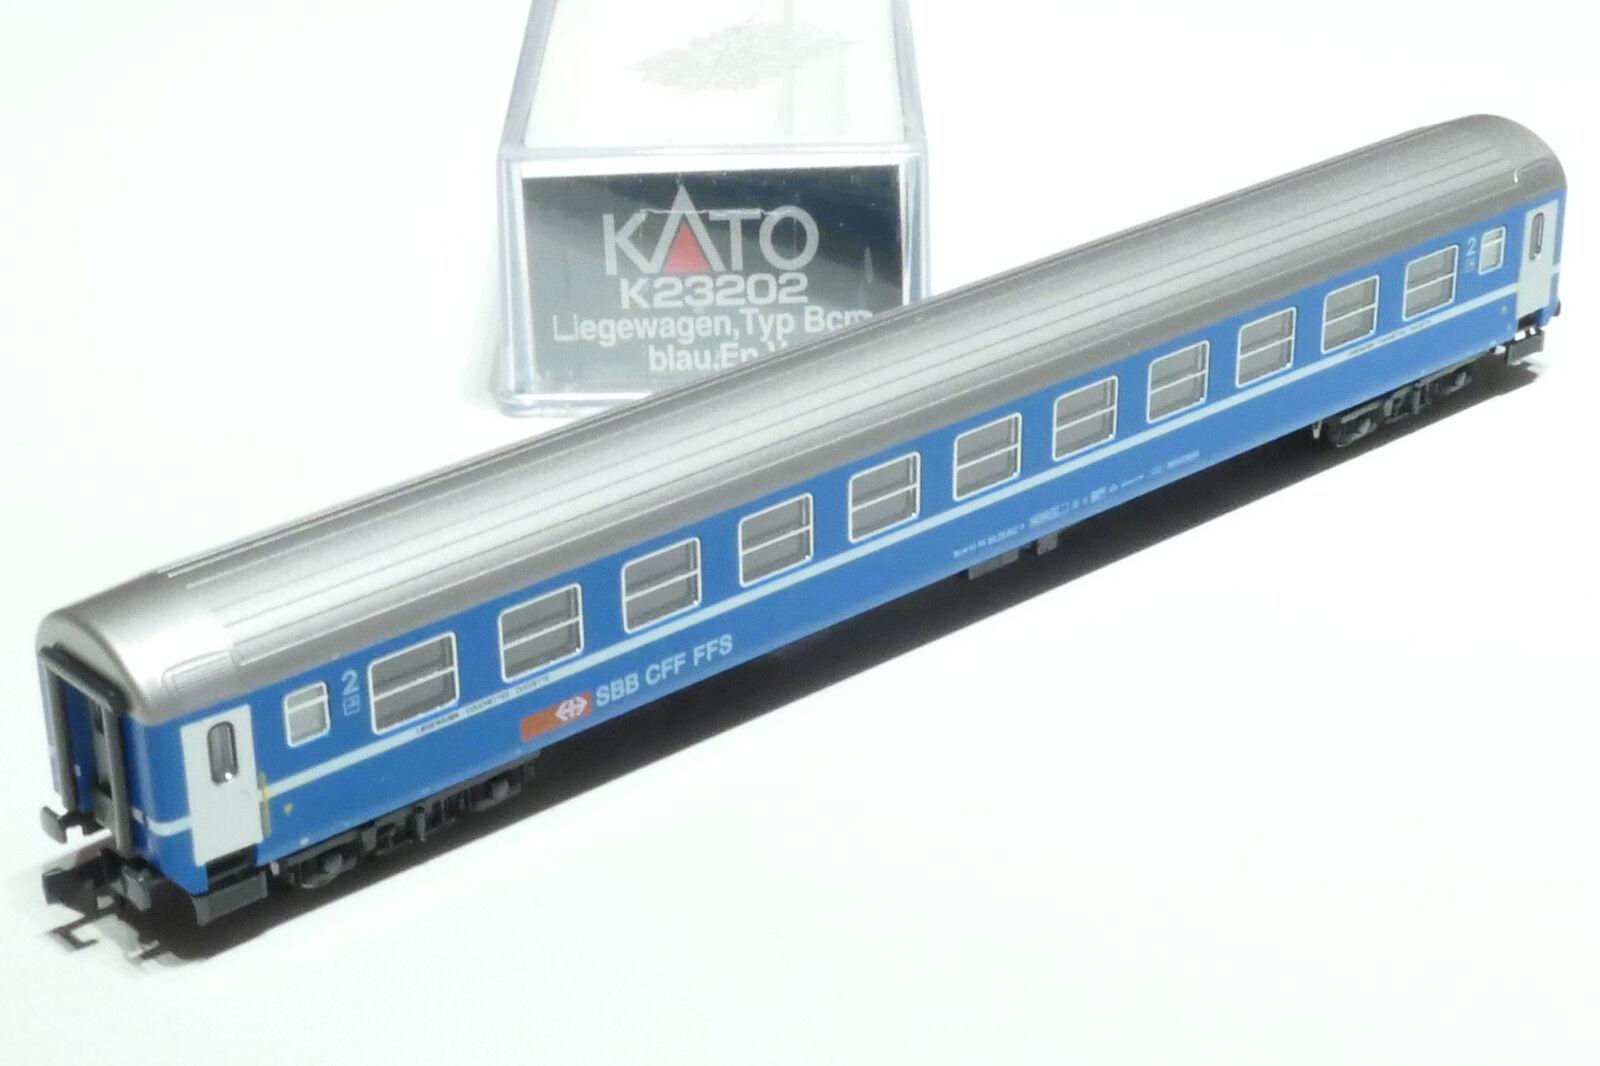 orden en línea Kato n n n SBB Ric 2. clase leigewagen azul k23202 OVP nuevo  venta caliente